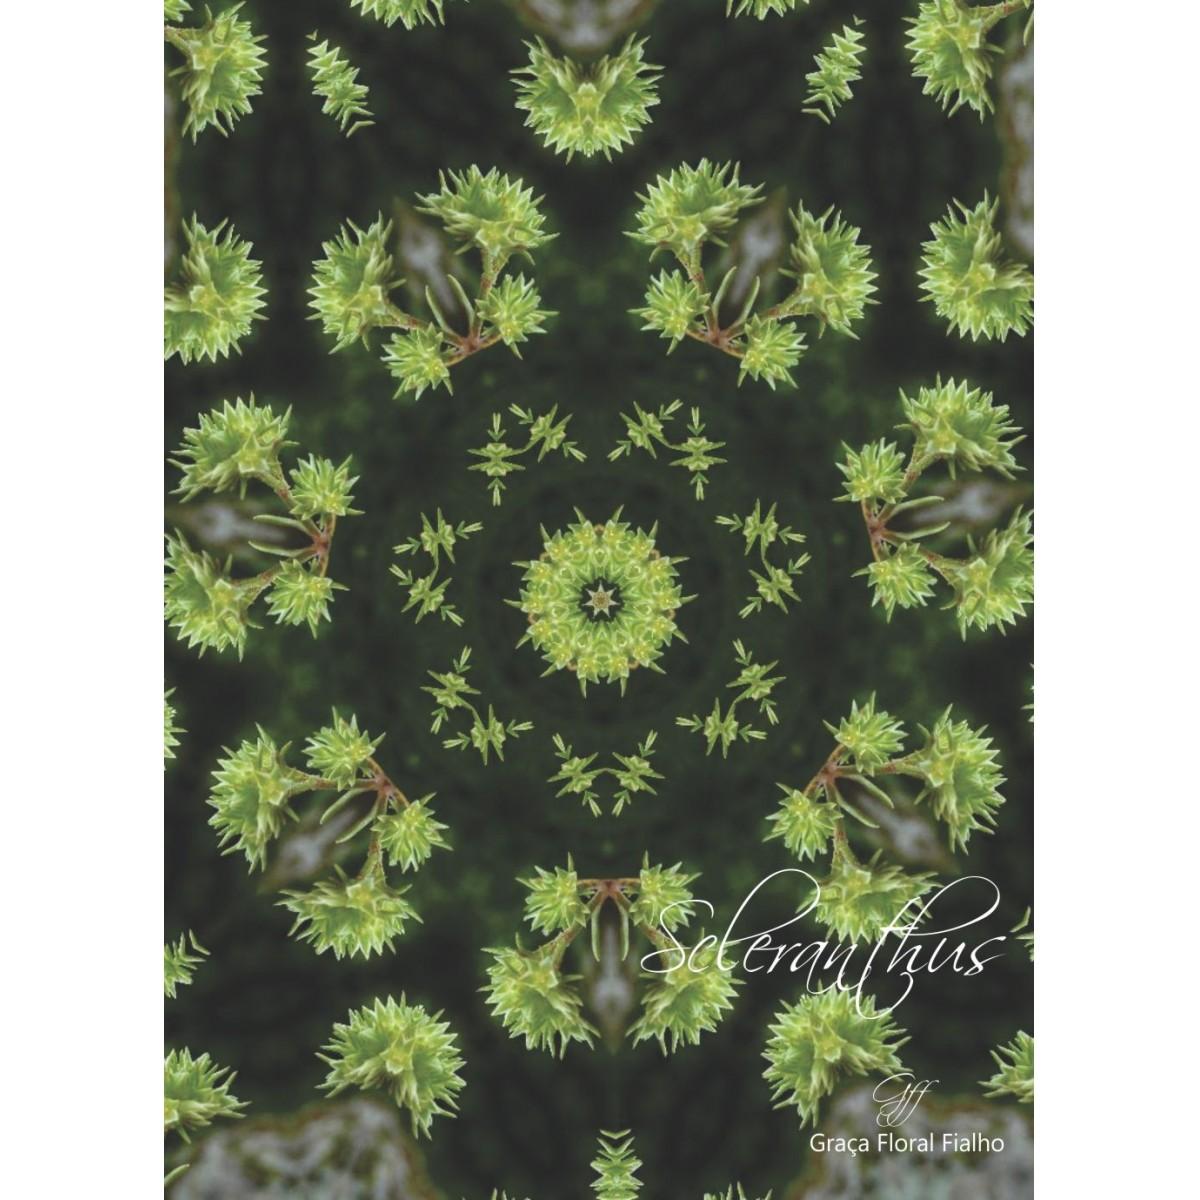 Poster Mandala Scleranthus